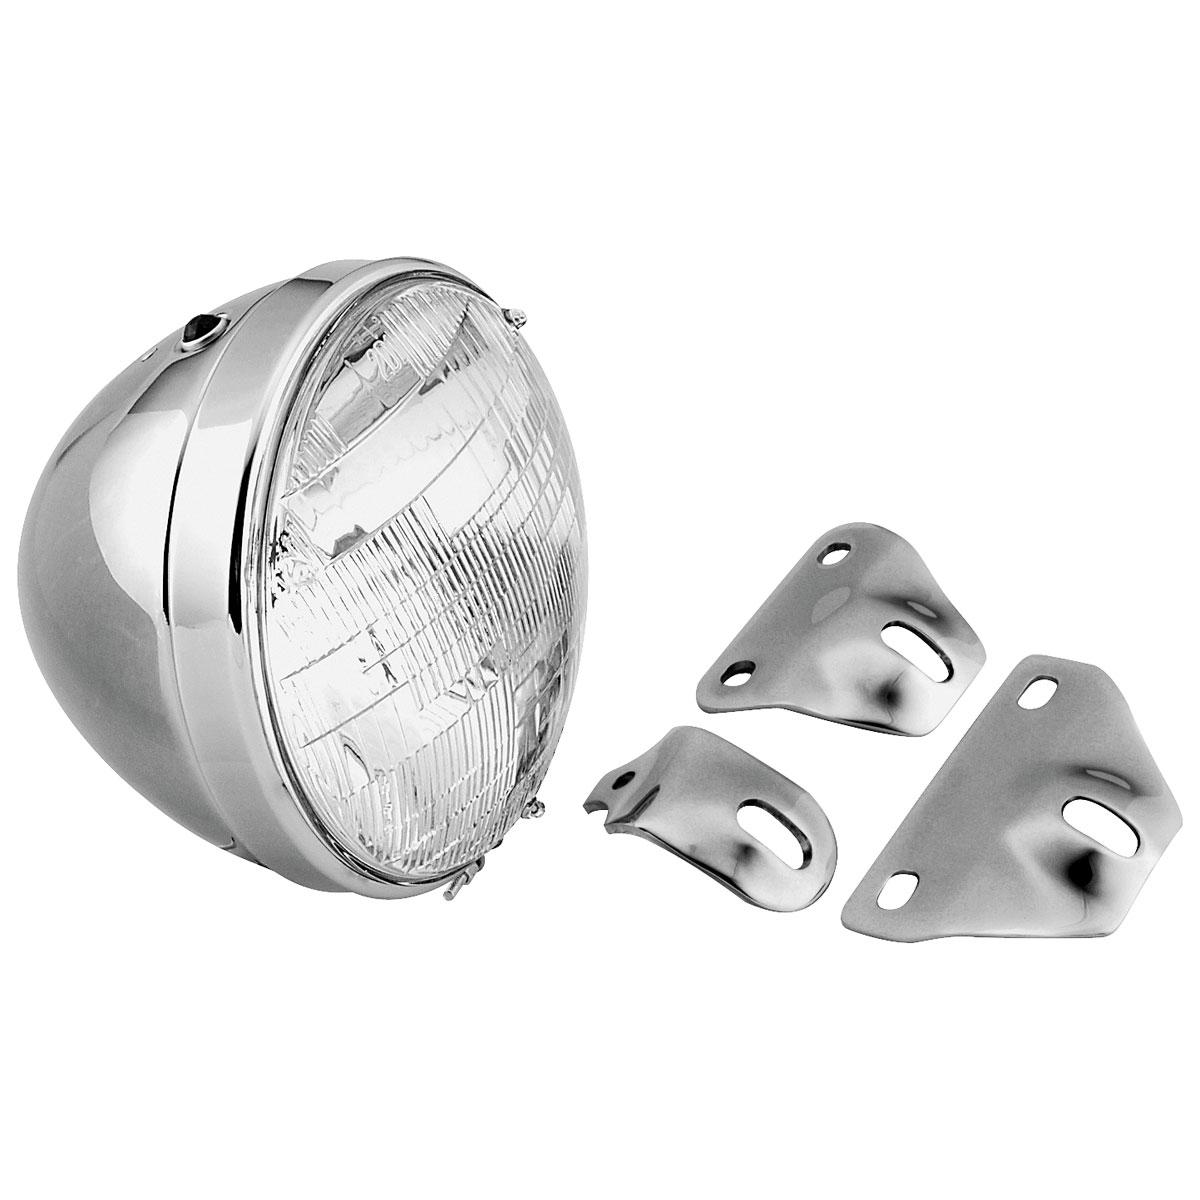 Paughco Bullet Headlight